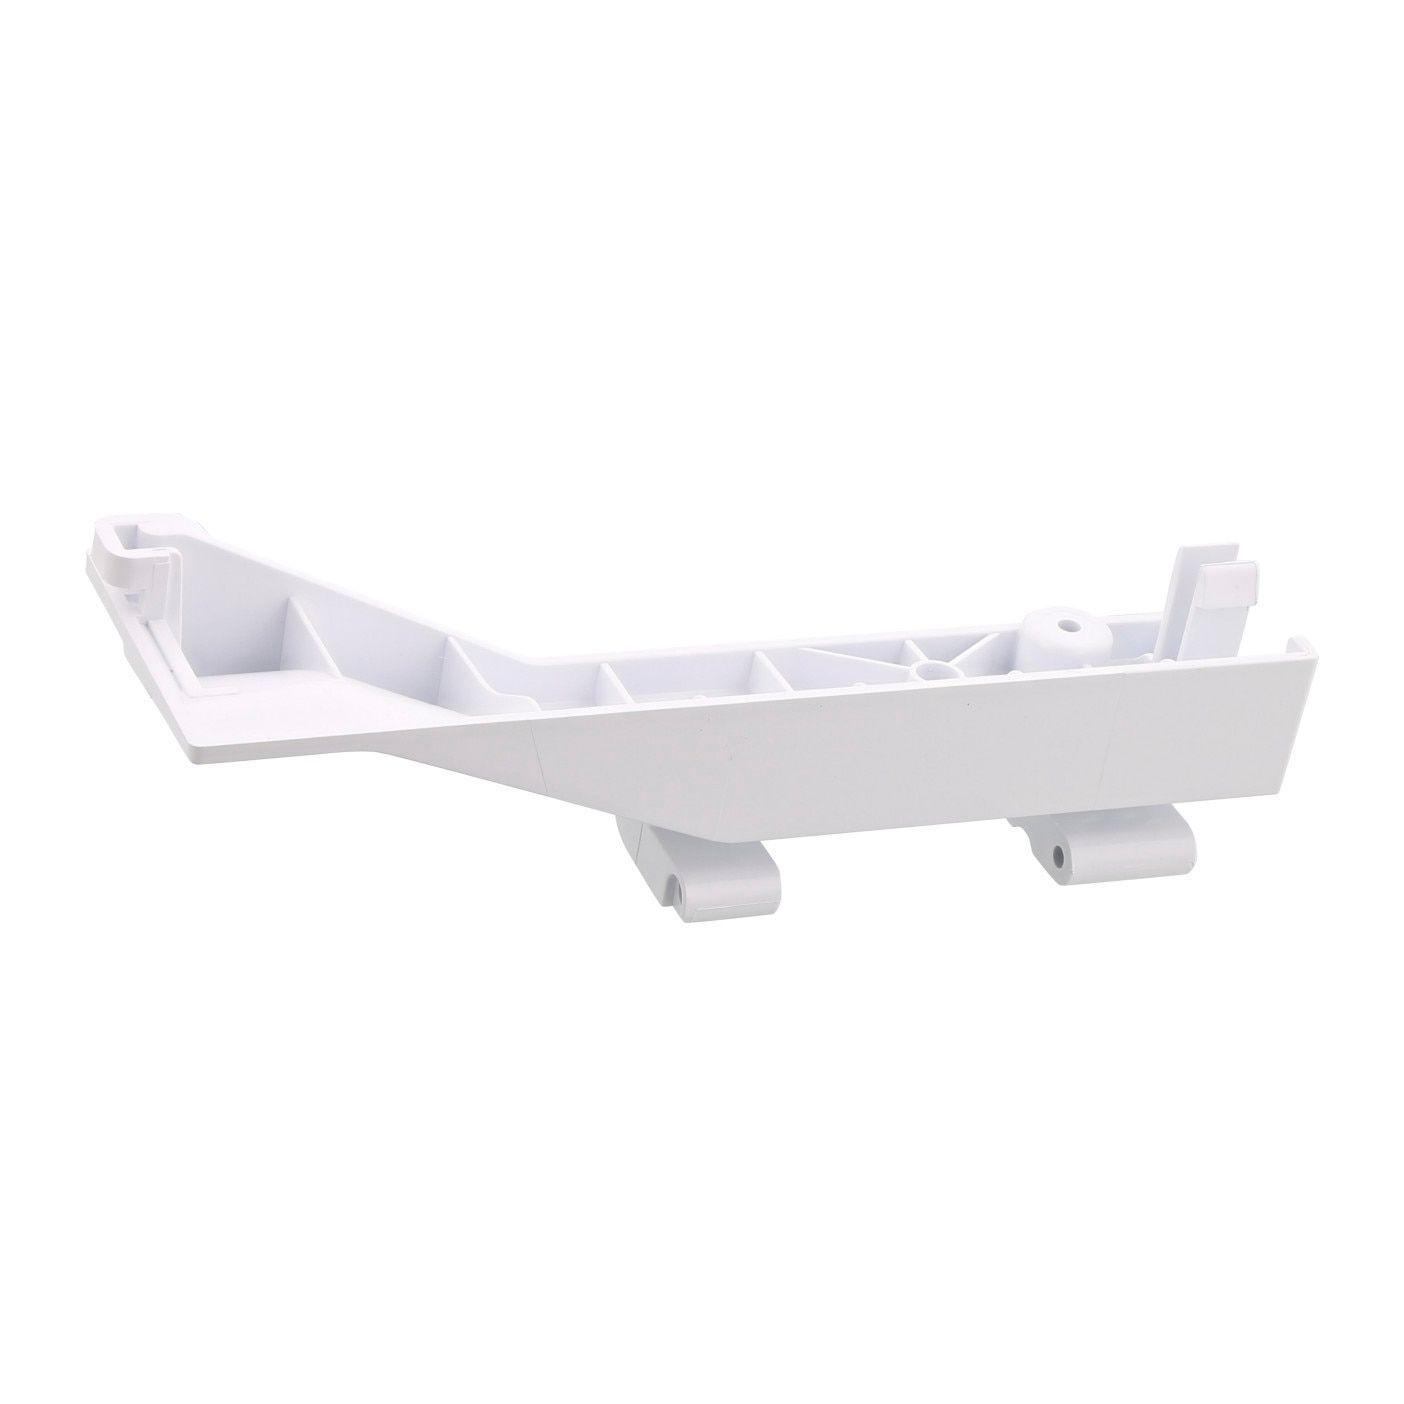 Hinge for Zanussi Electrolux AEG Tumble Dryers AEG / Electrolux / Zanussi